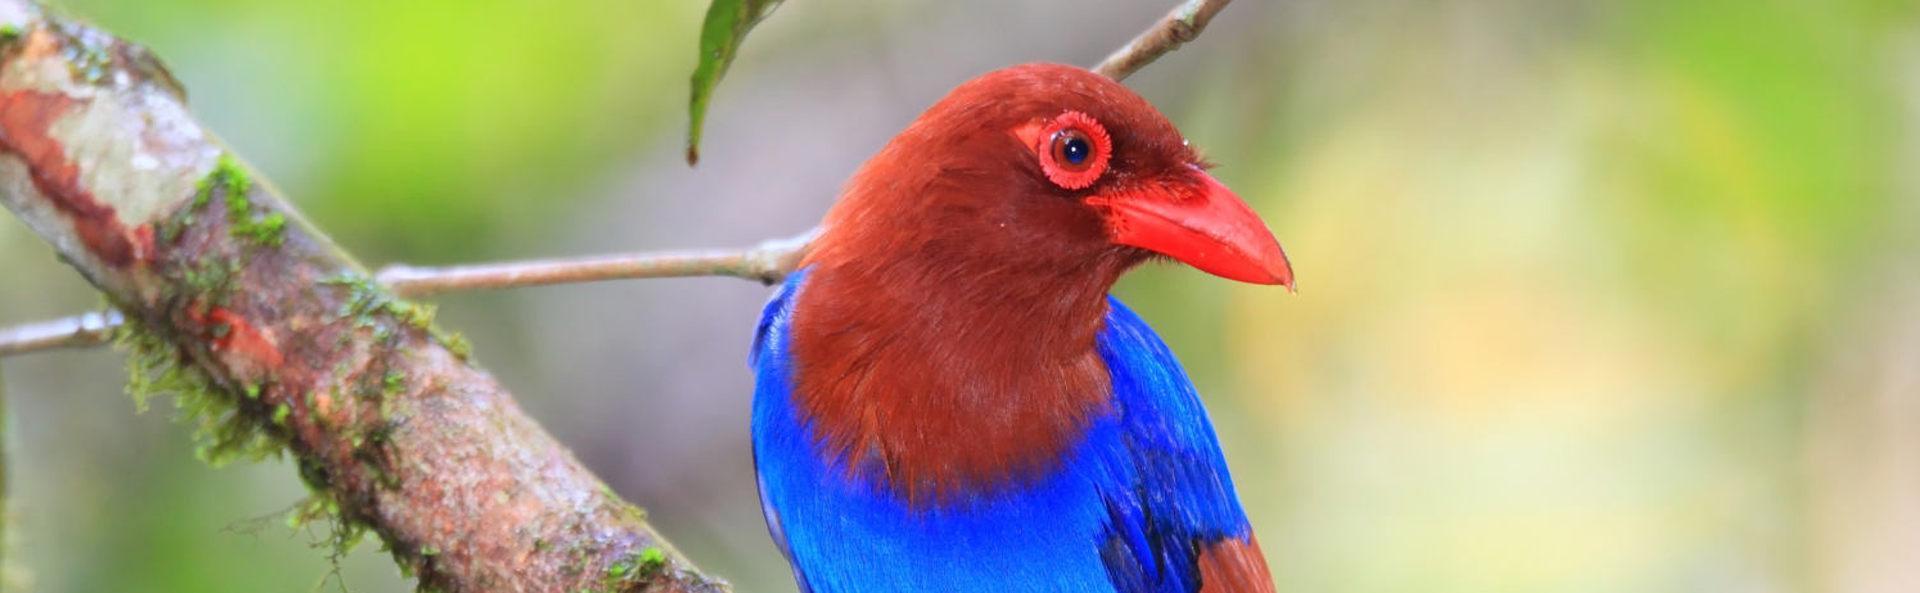 Bundala Ceylon Blue Magpie